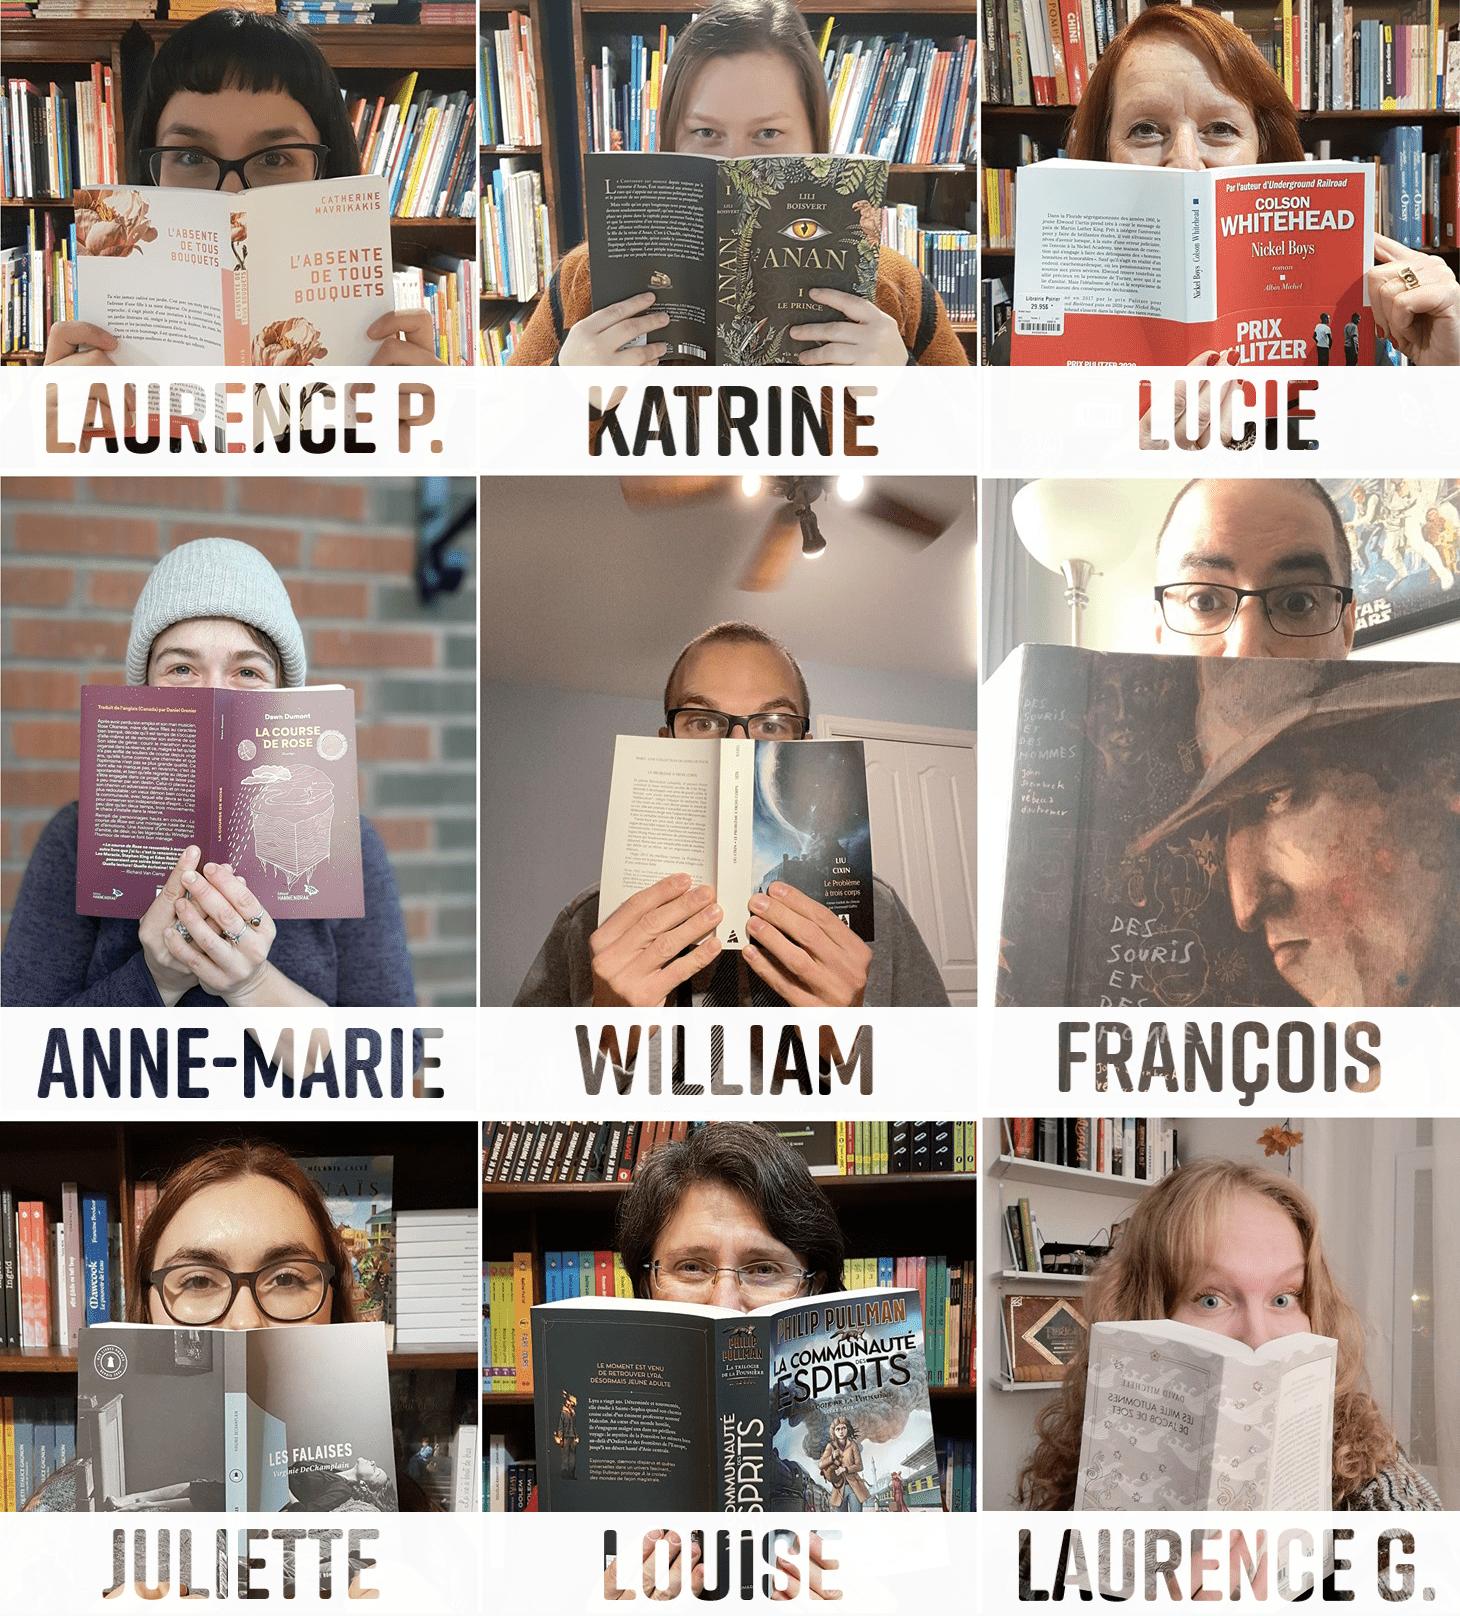 employe_a_livre_ouvert_librairie_poirier_tr